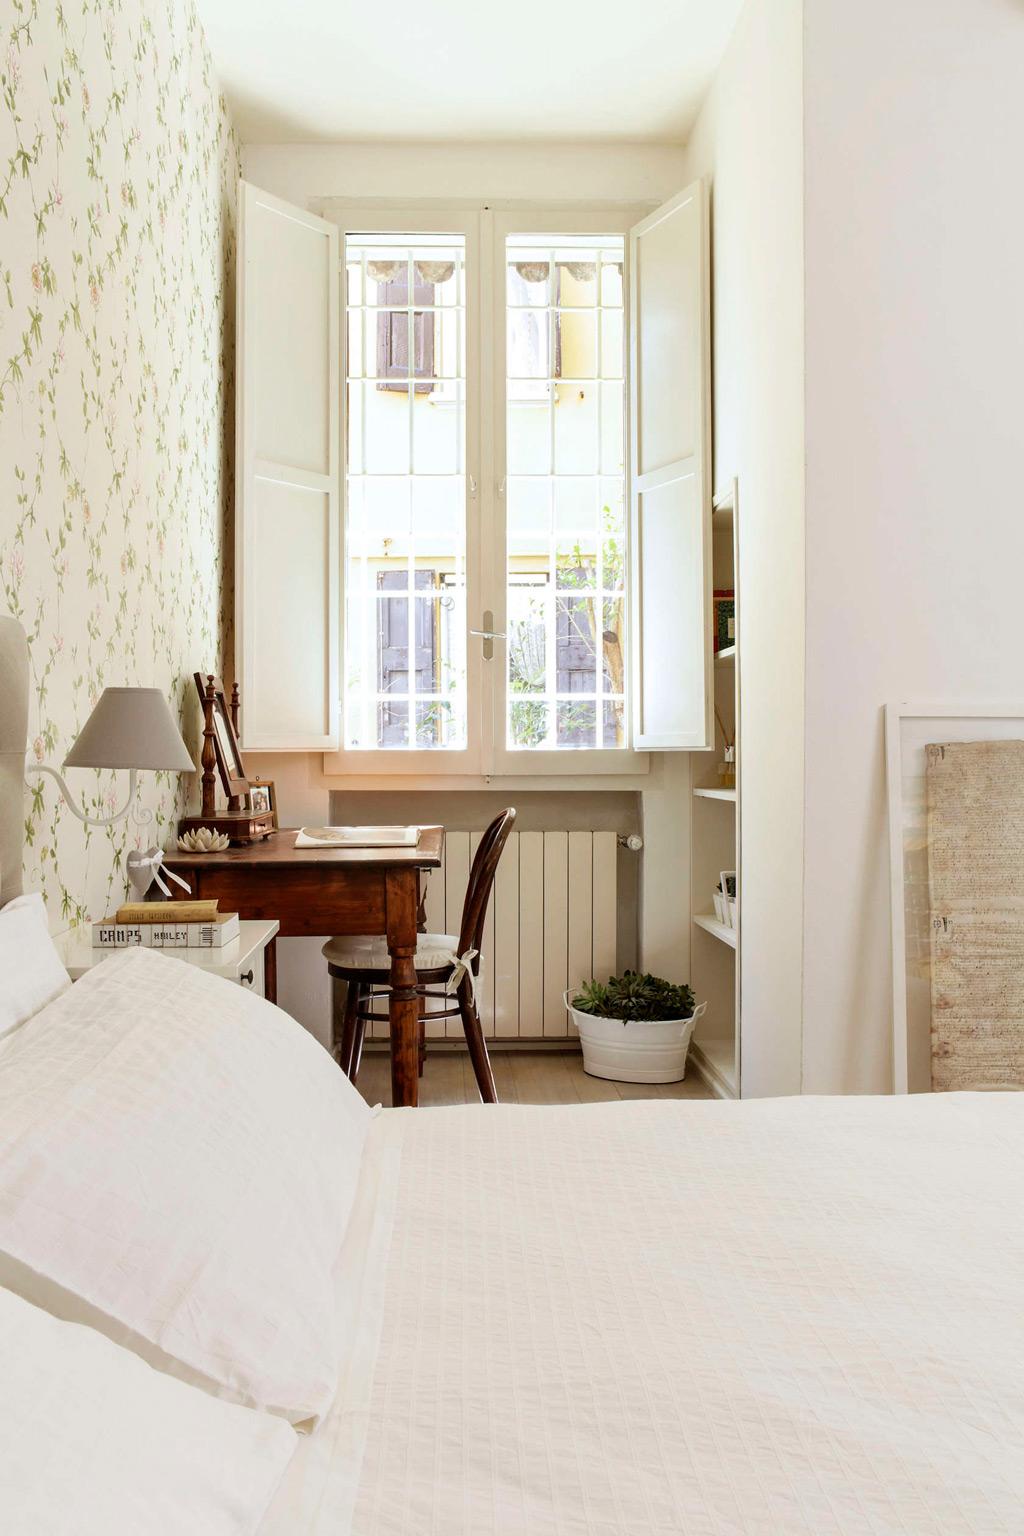 little-cottage-bettini-architetto-11